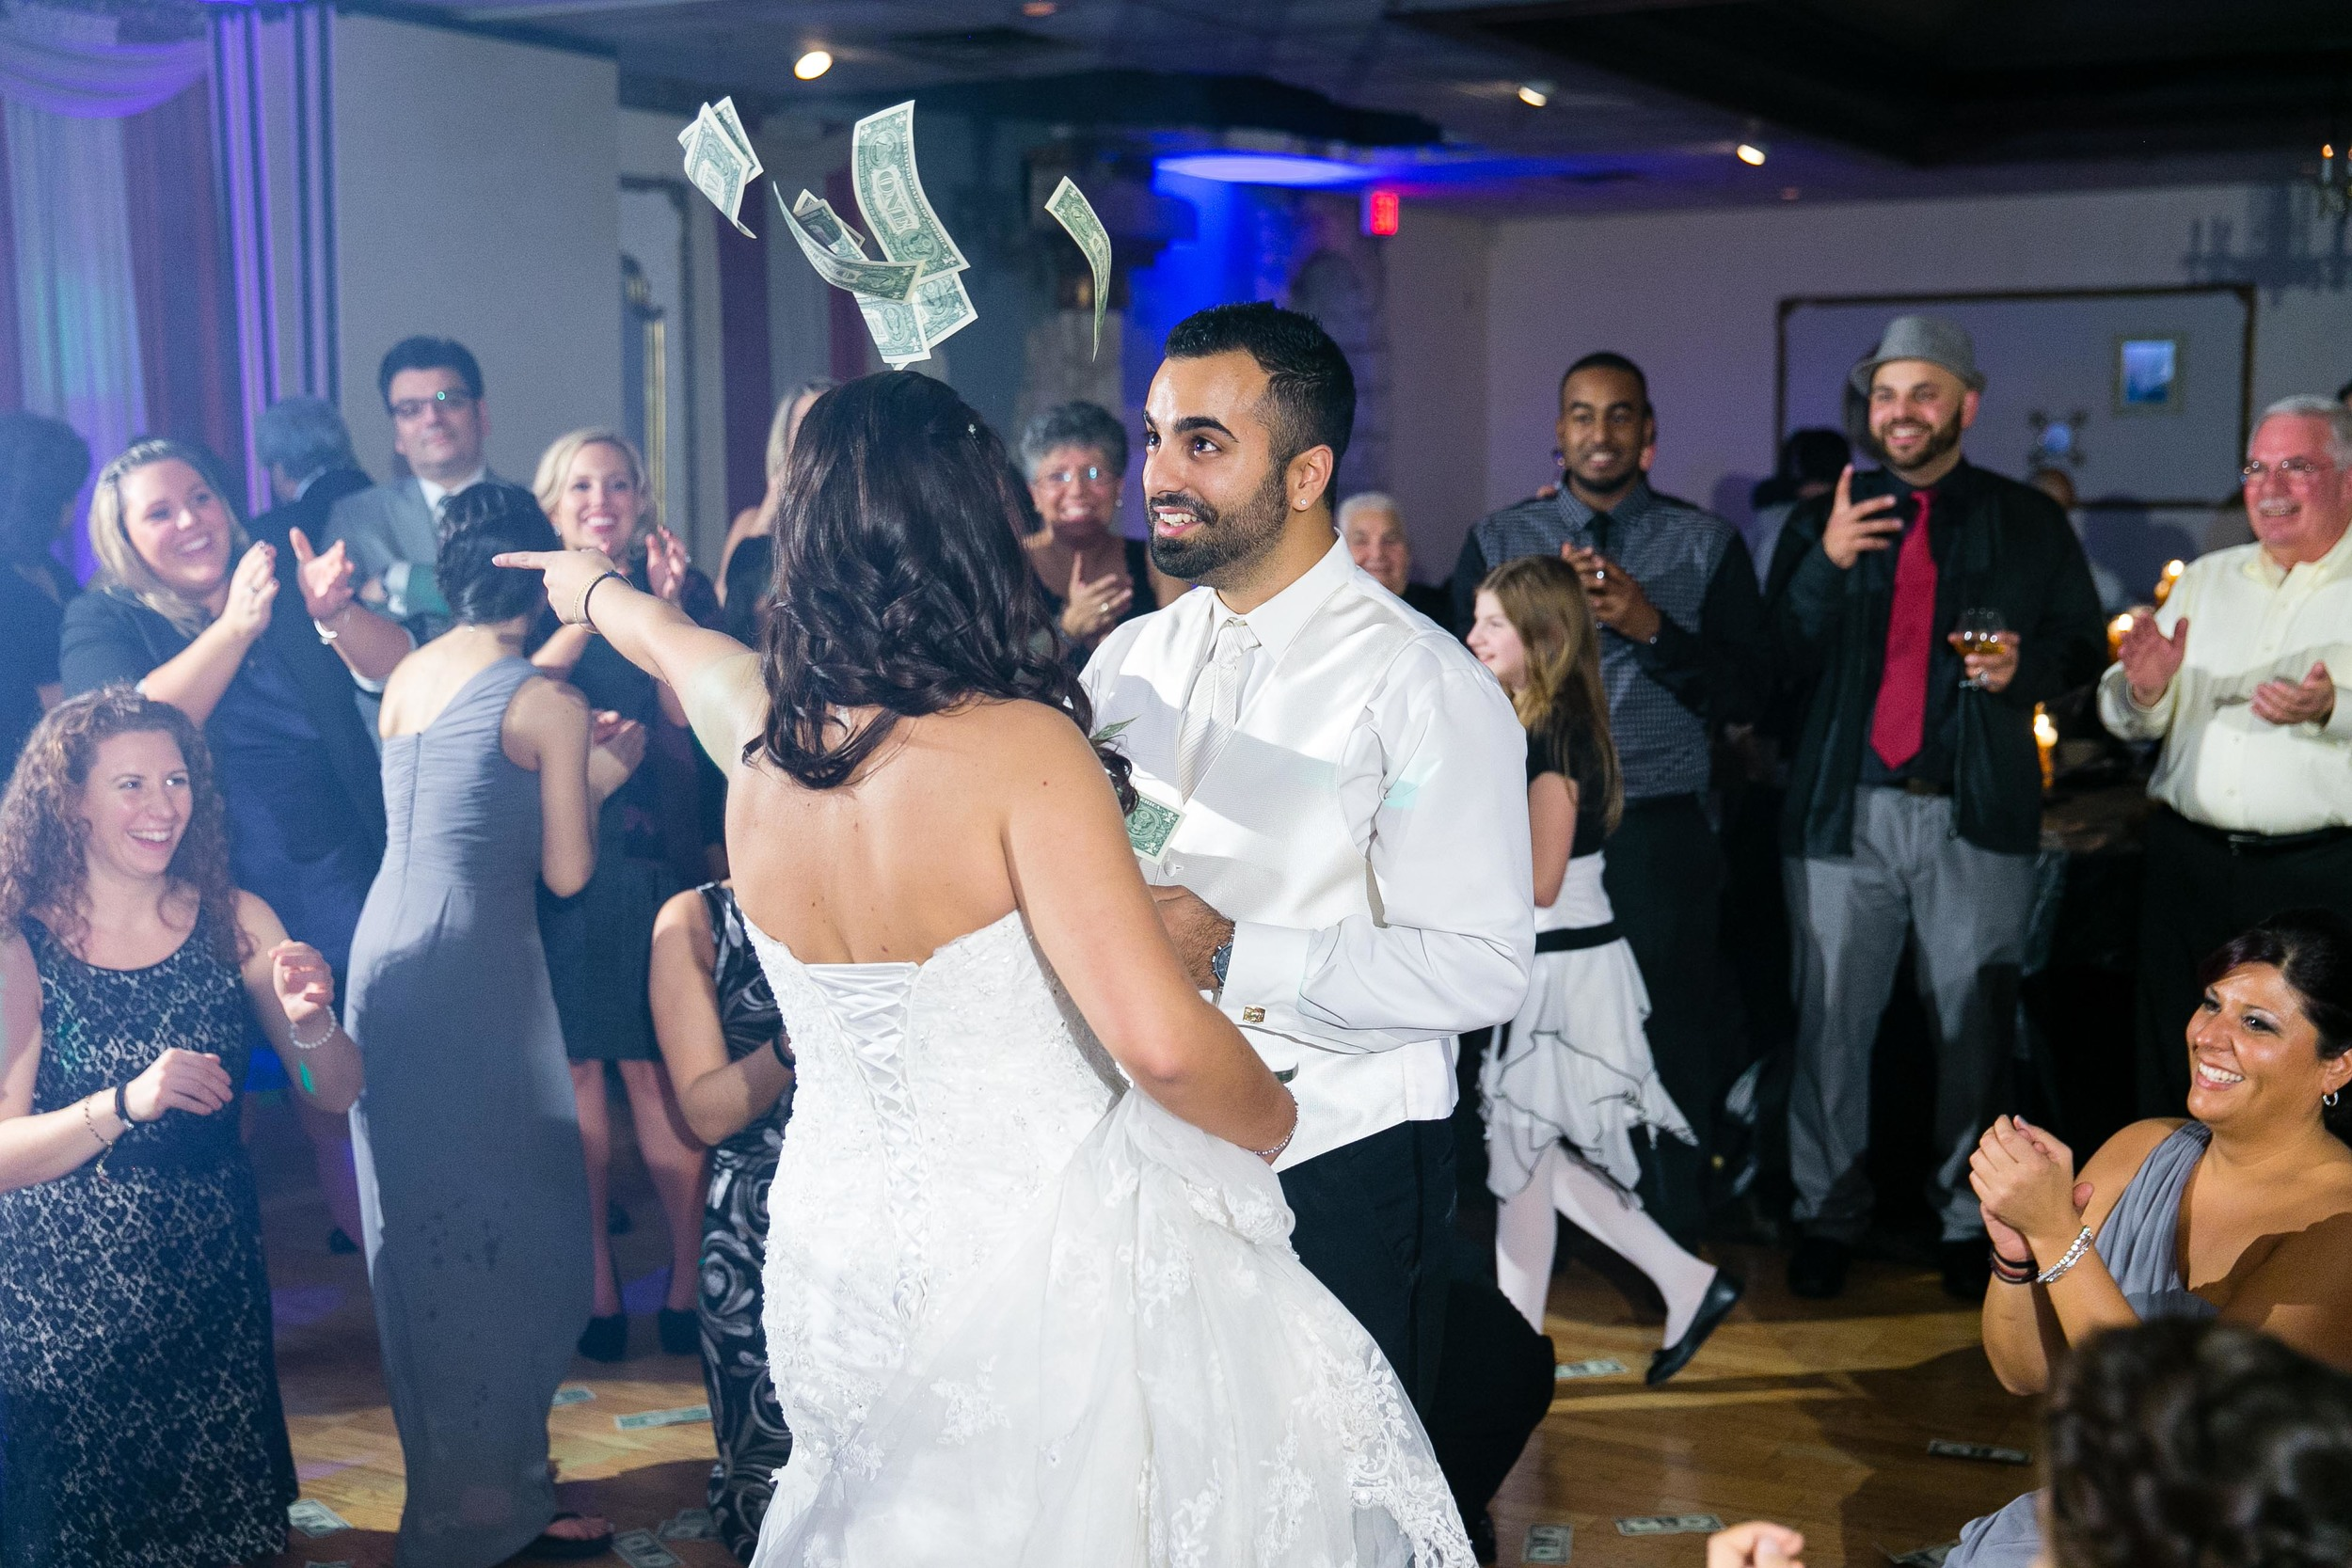 Greek-Wedding-Hartford-La-Notte-Restaurant-Connecticut-Documentary-Wedding-Photography-by-Jacek-Dolata-24.jpg